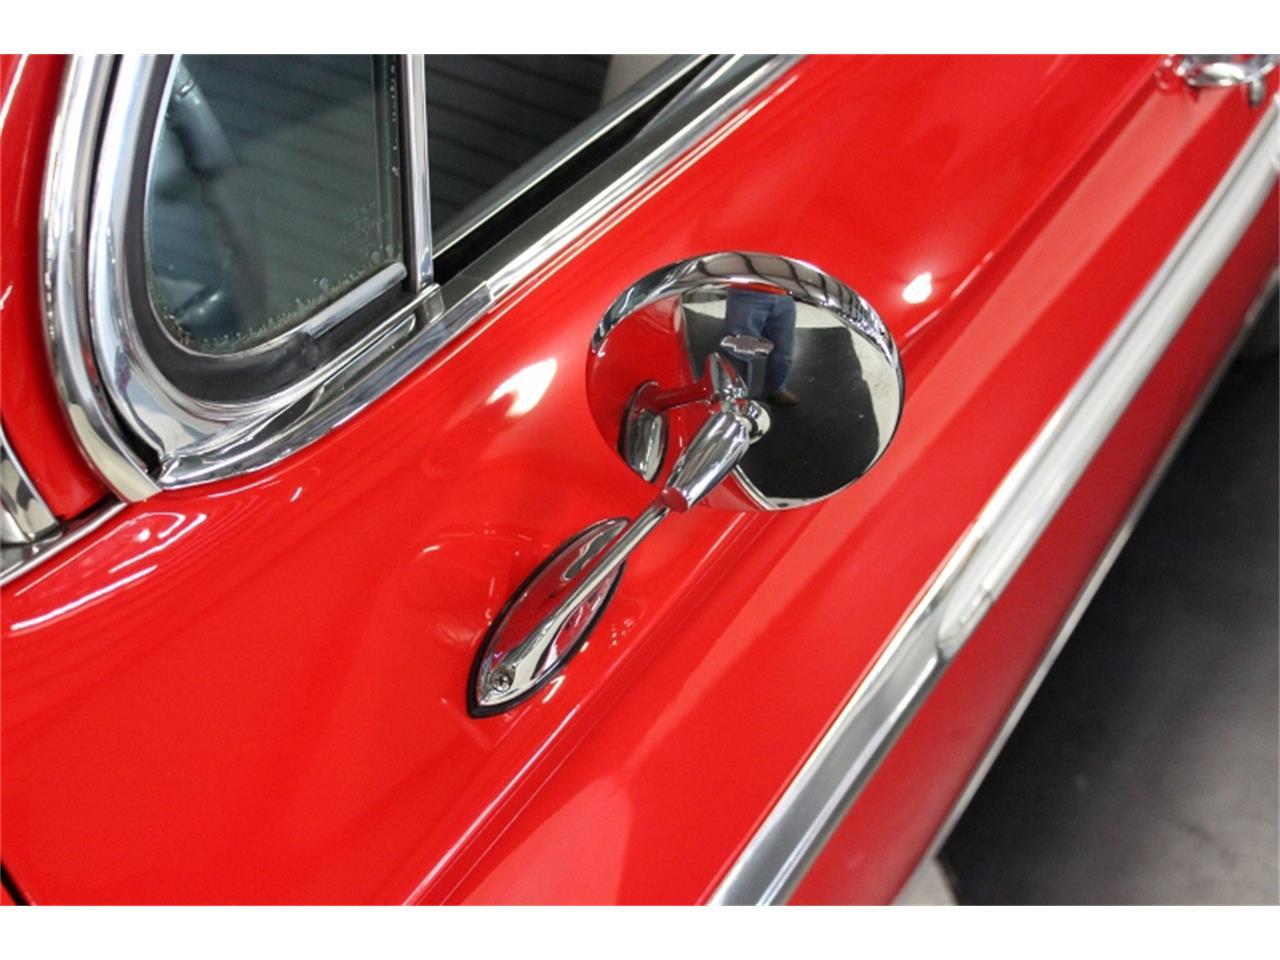 Large Picture of Classic 1961 Chevrolet Impala located in Lillington North Carolina - $58,000.00 - J60W